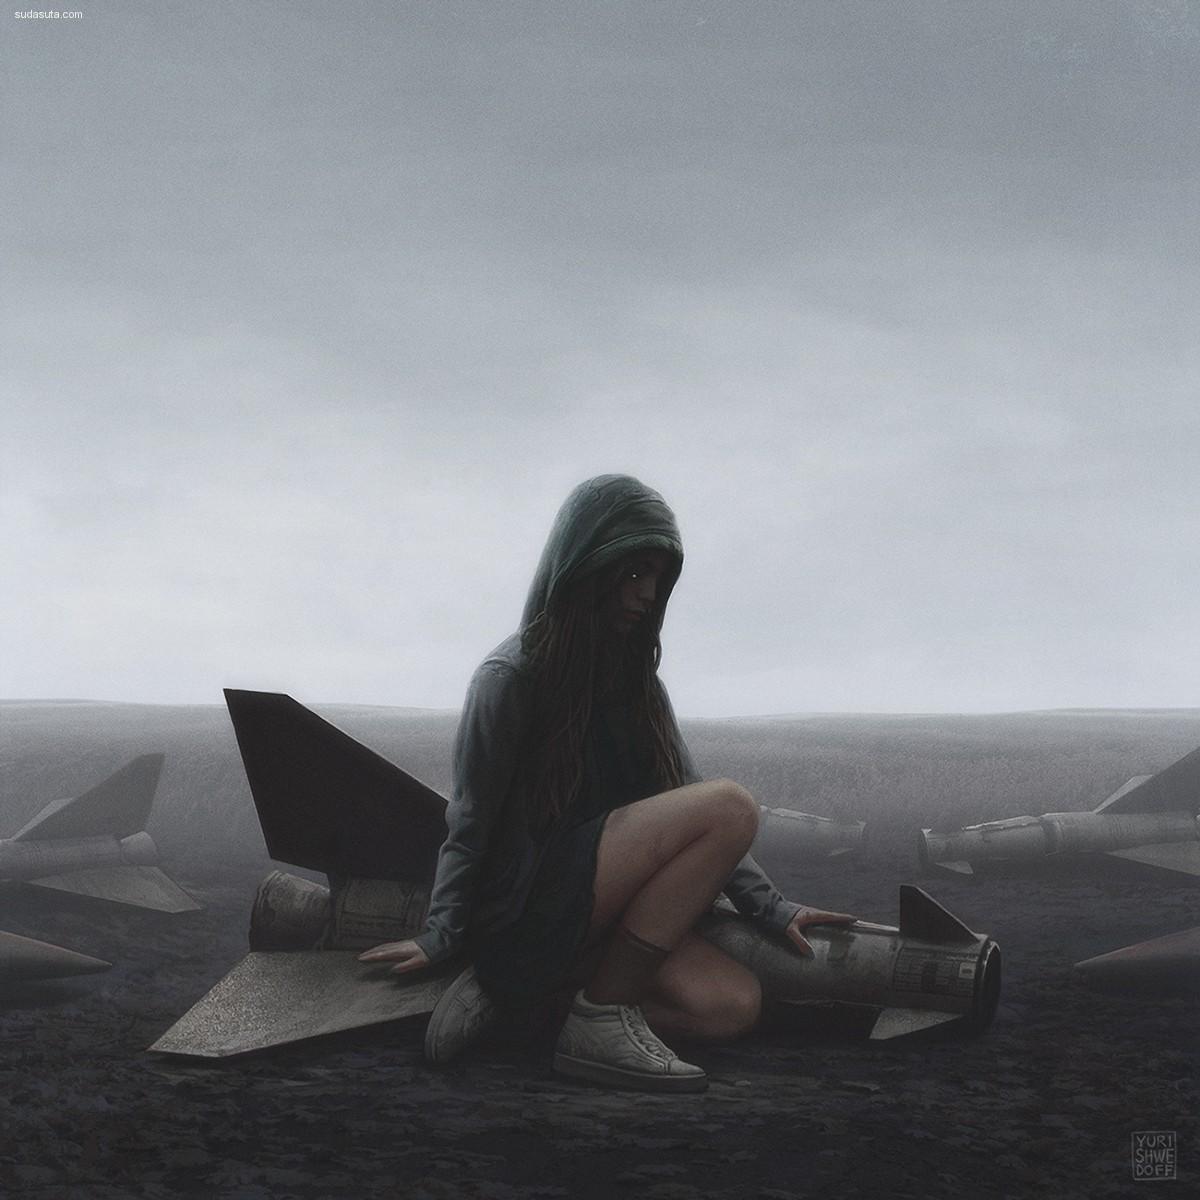 YURI SHWEDOFF 未来世界 概念插画作品欣赏